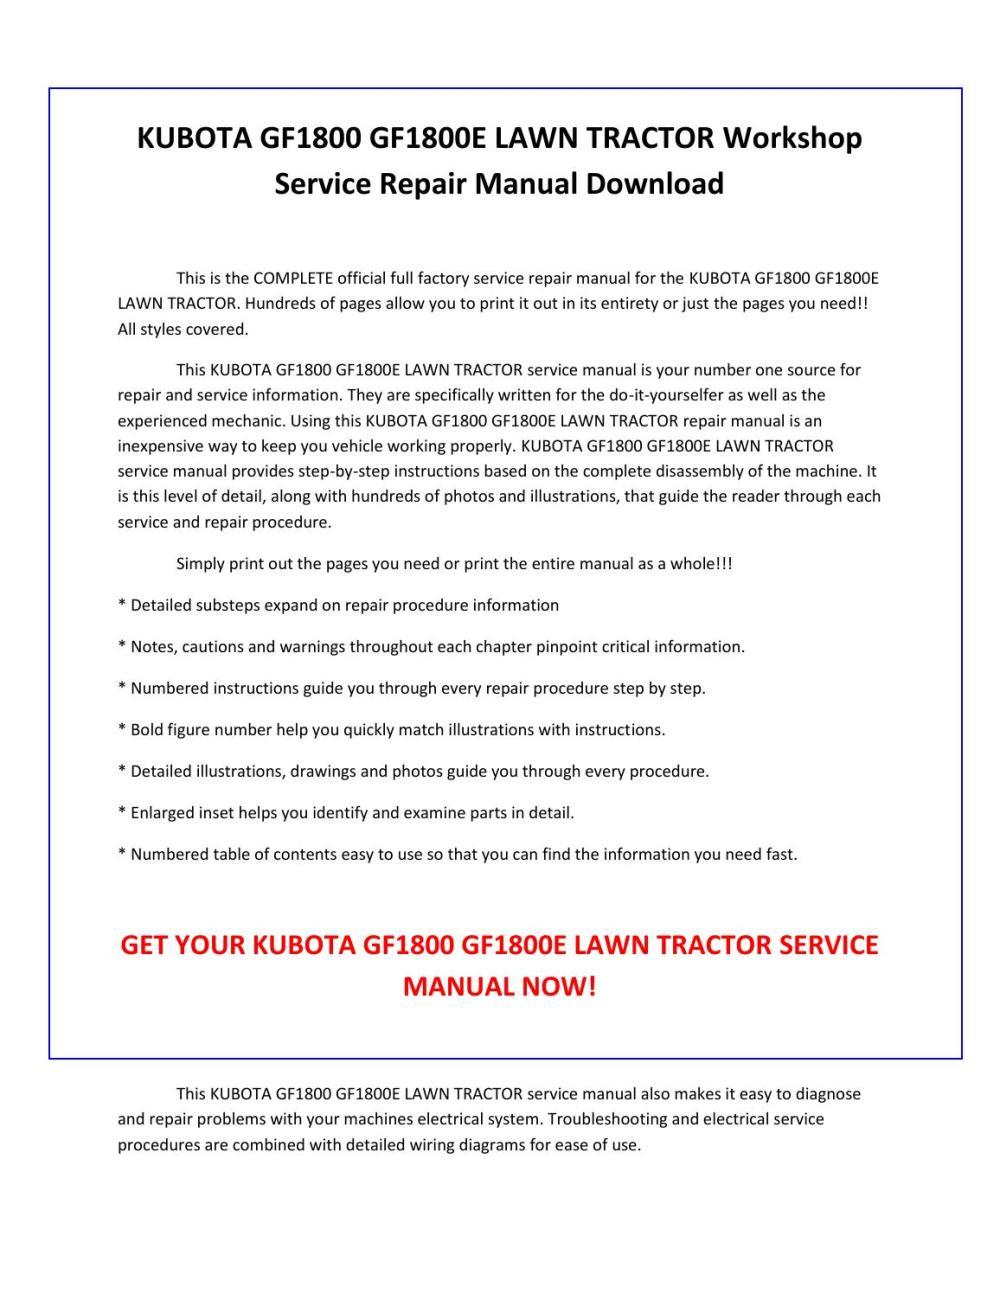 medium resolution of kubota gf1800 gf1800e lawn tractor service repair manual pdf download by sparchita3 issuu